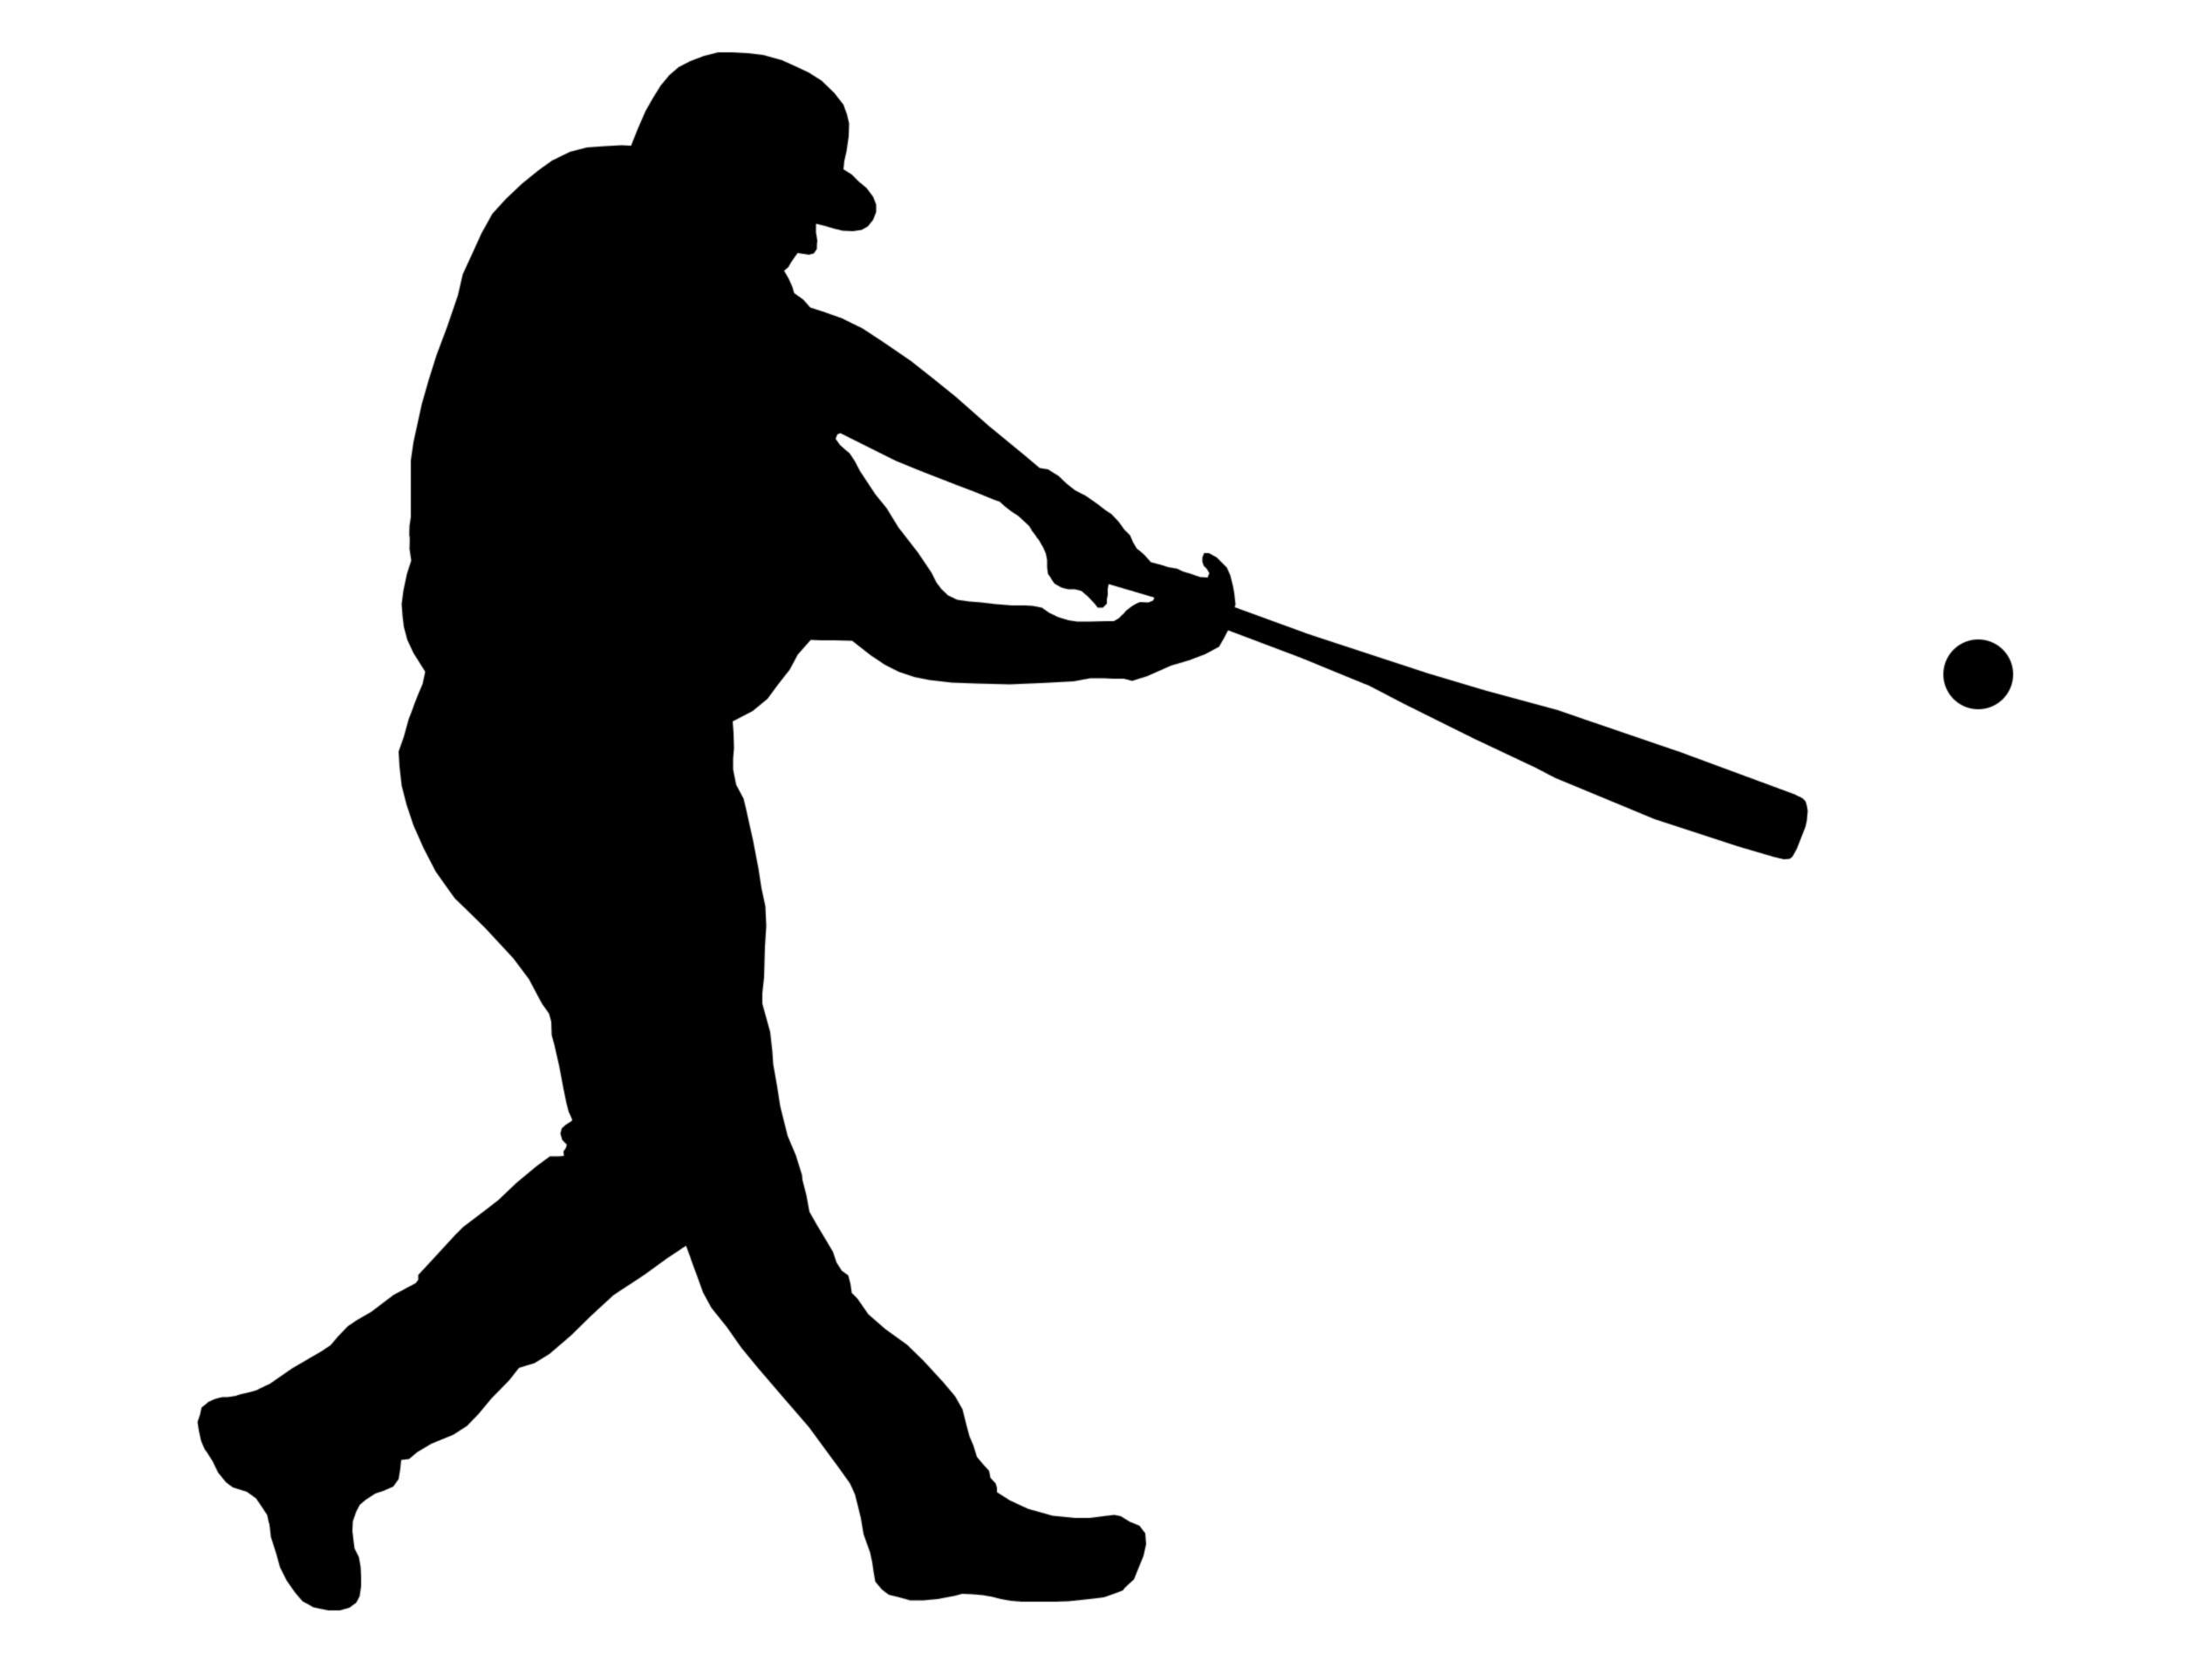 2536x1904 Baseball Player Silhouette Yiqiqu Beauteous Players Silhouettes